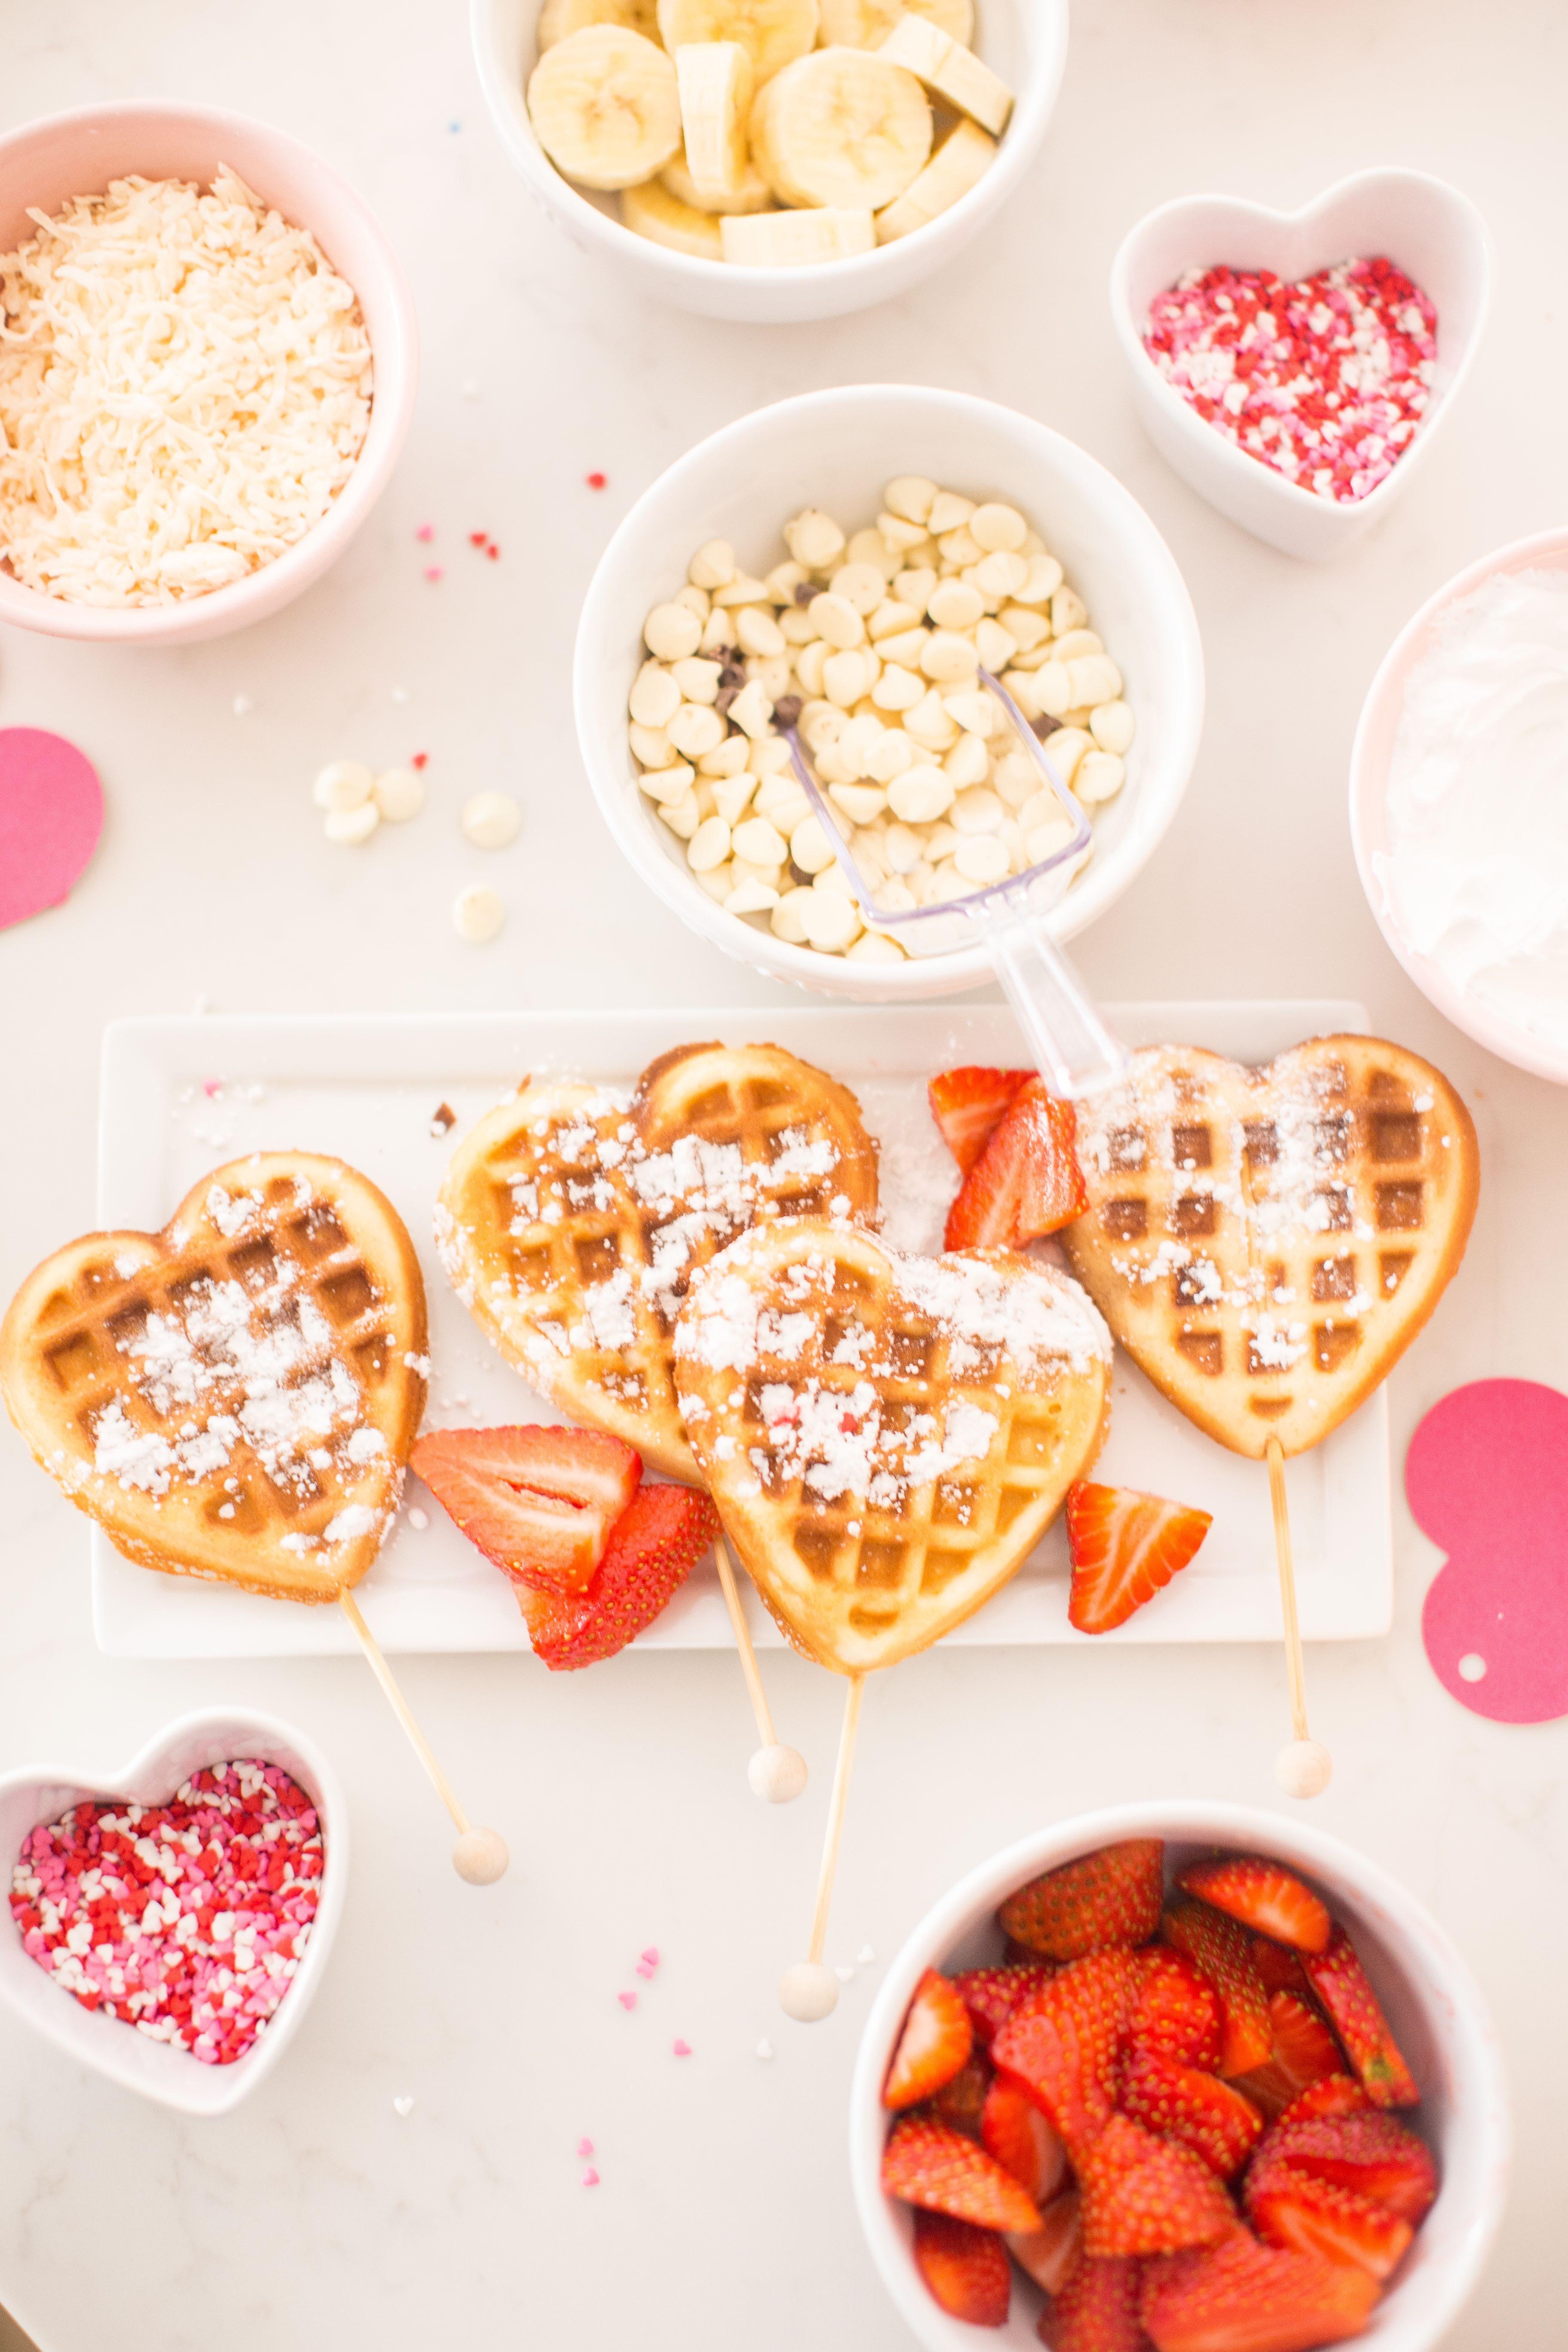 Valentines Heart Shaped Waffles Just Destiny 16 Resize